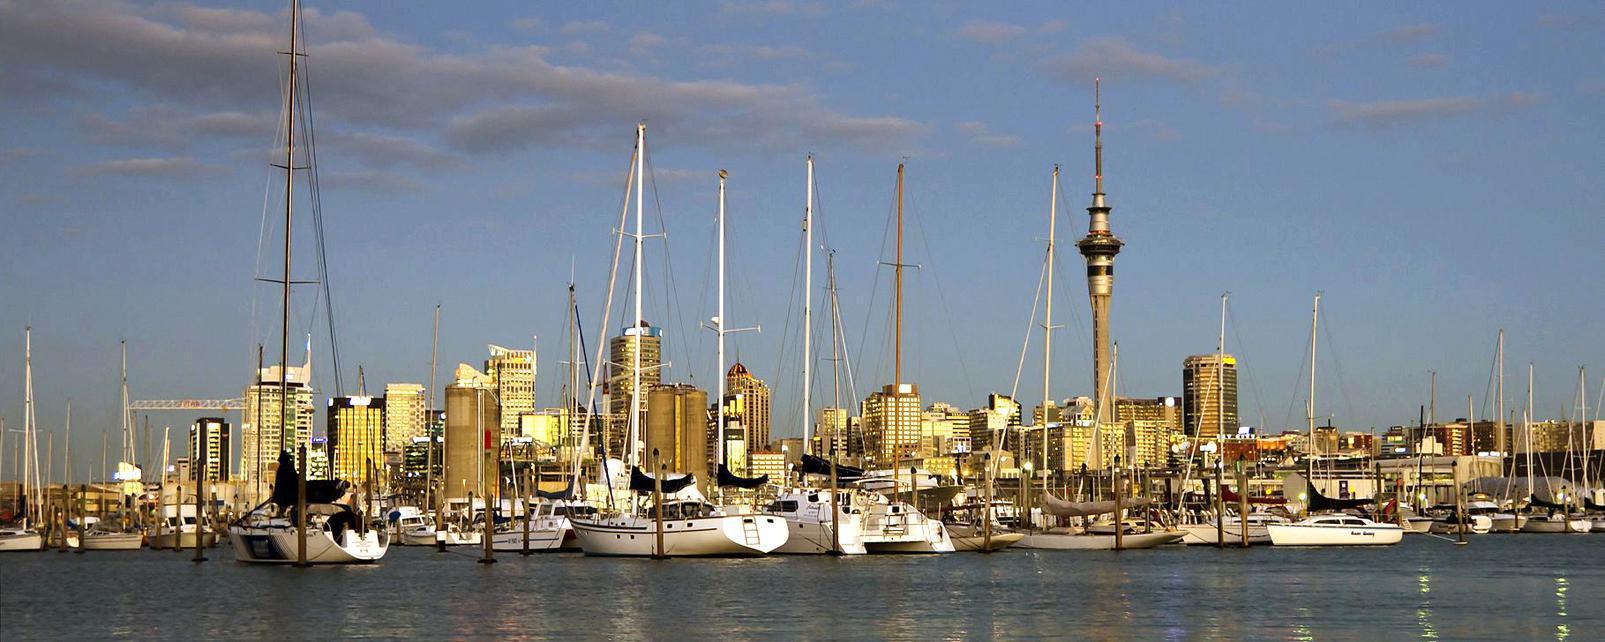 Océanie; Nouvelle-Zélande; Auckland;